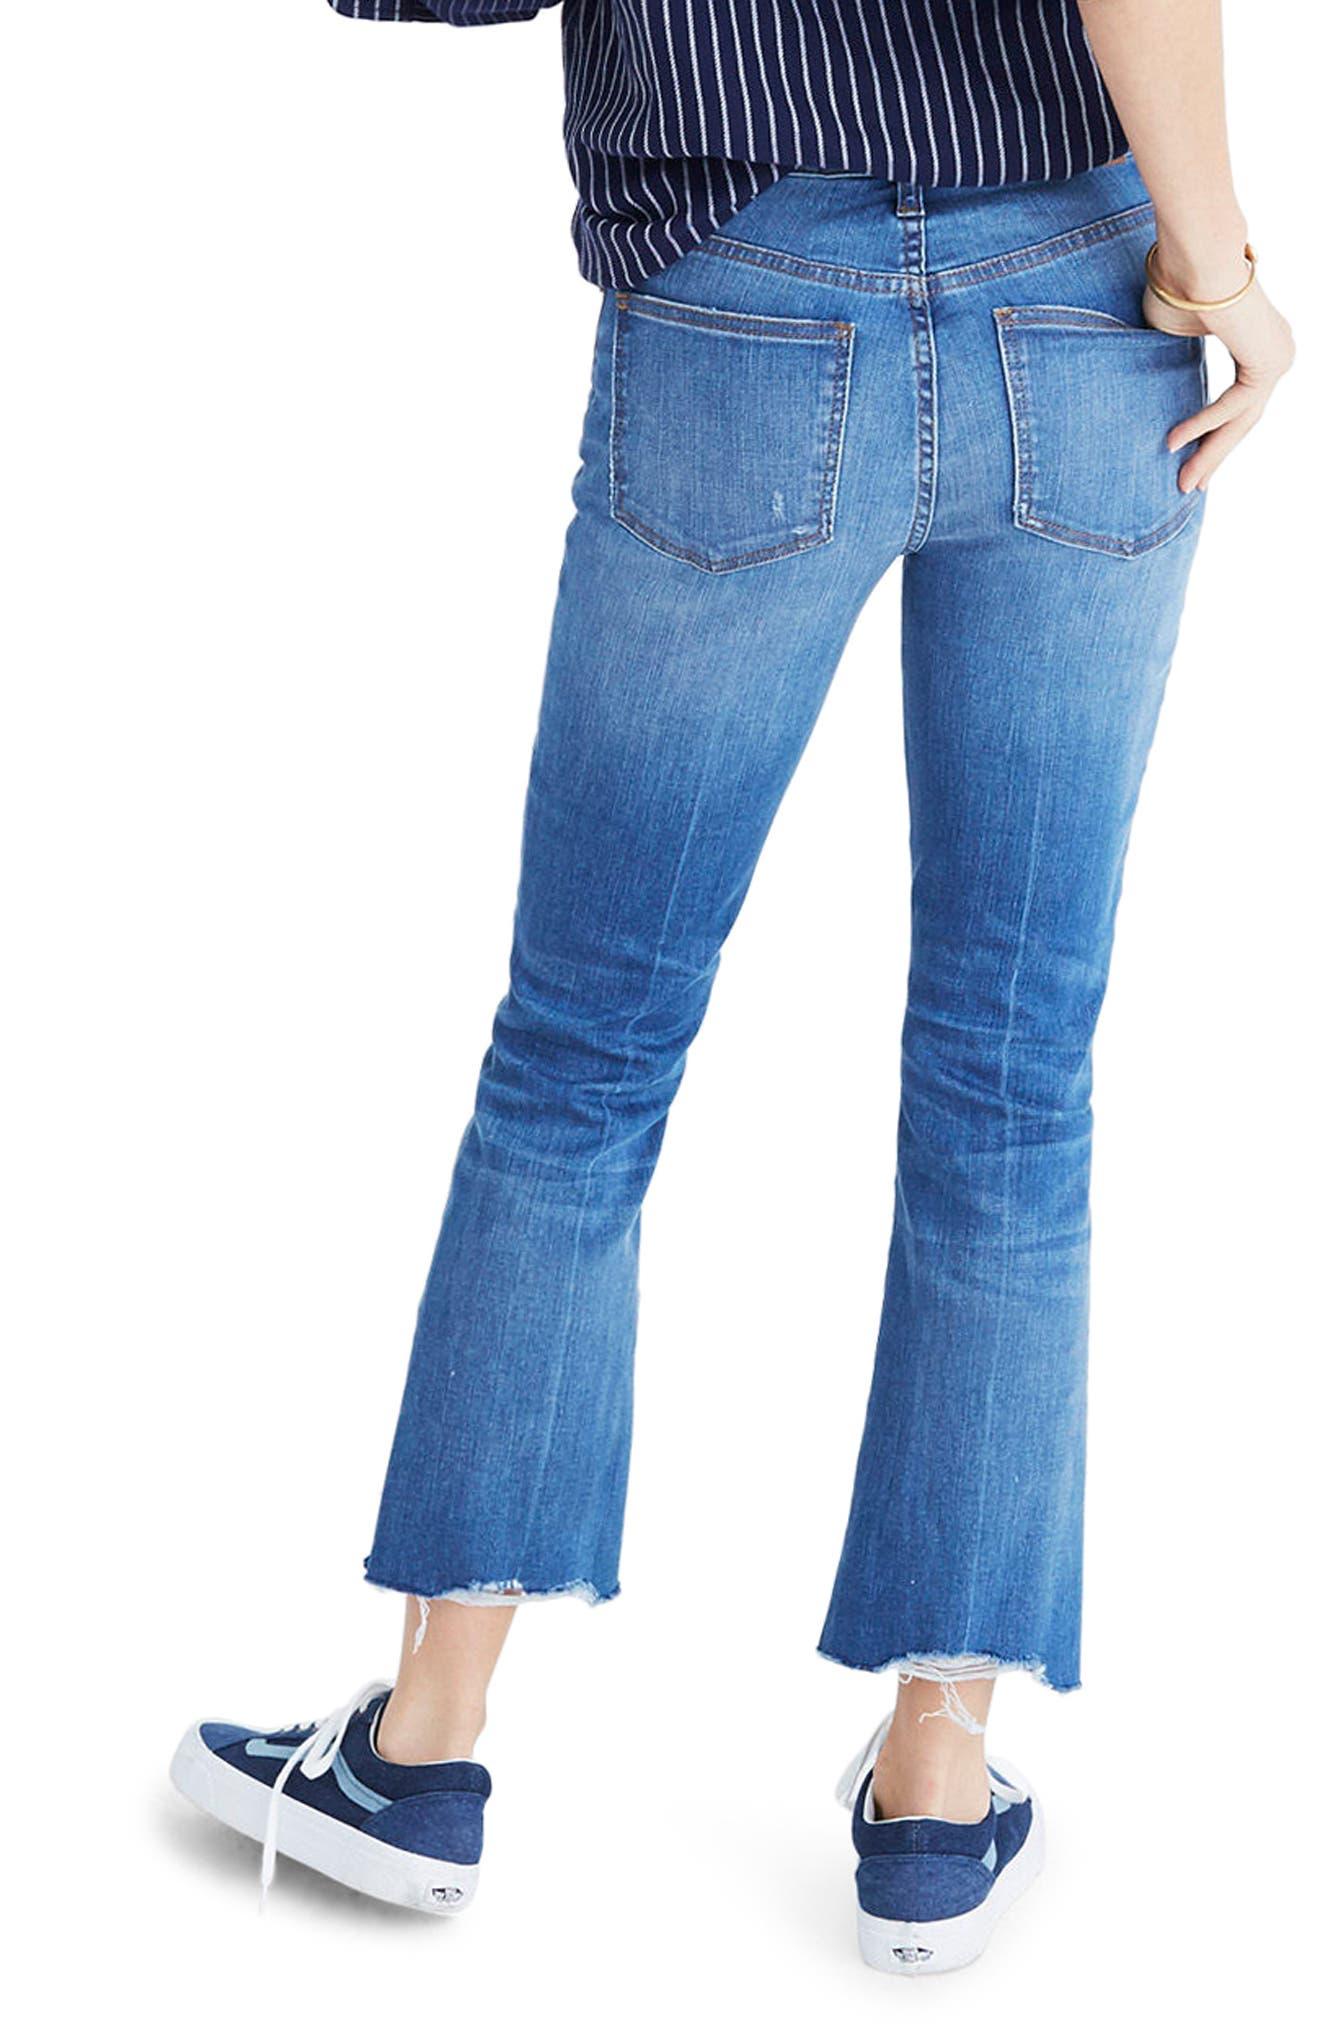 Cali Demi Boot Jeans,                             Alternate thumbnail 2, color,                             Haywood Wash